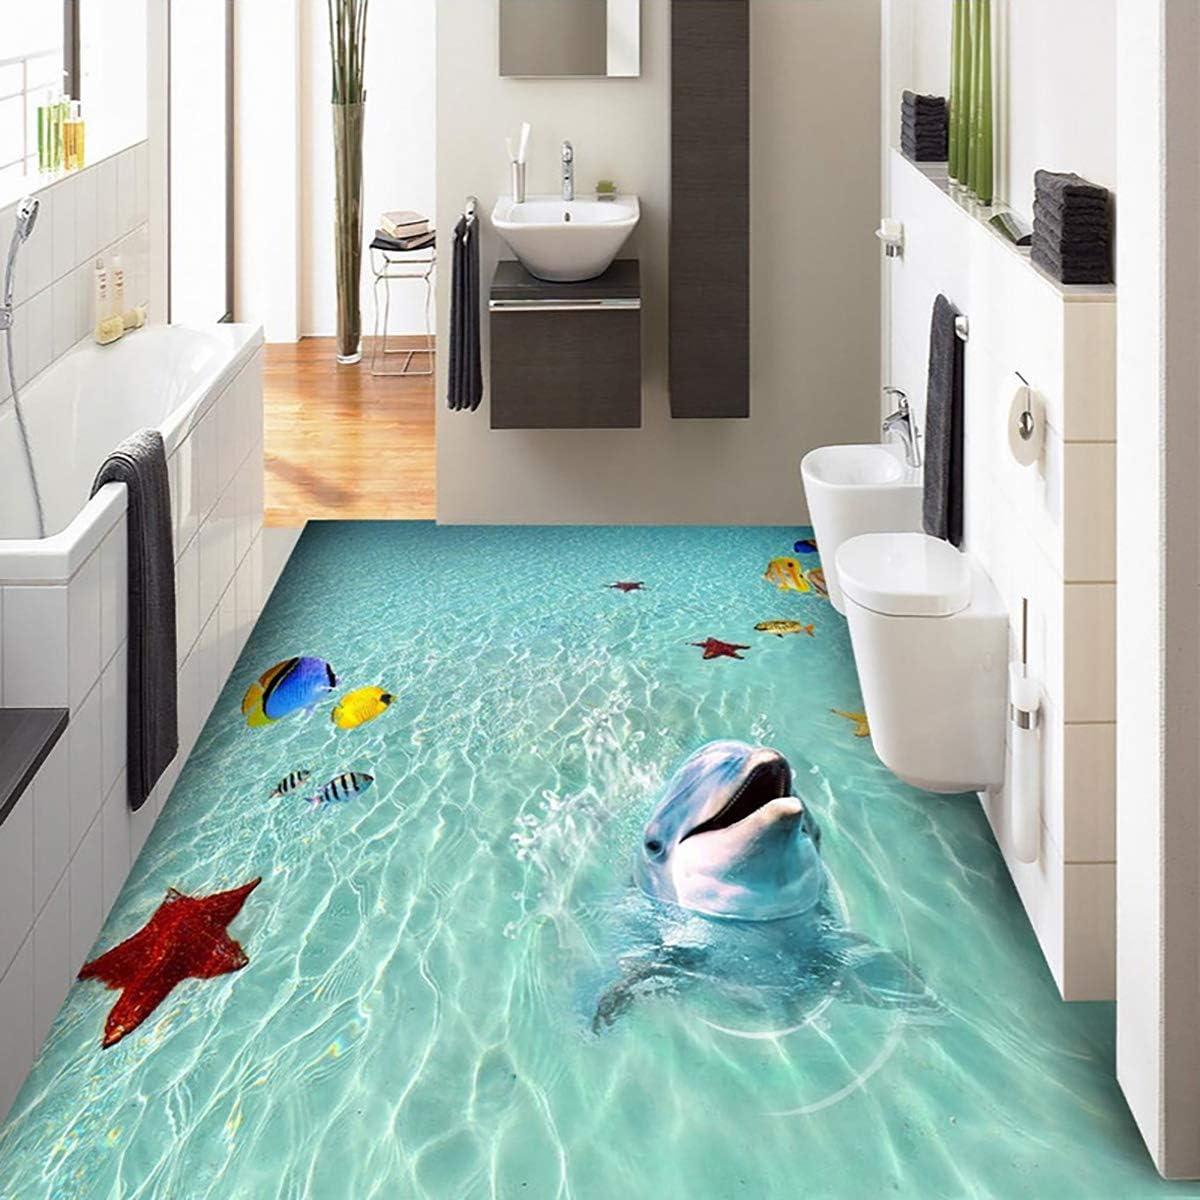 ECYC 3D Water Waves Beach Tiles Ocean Creative Floor Waterproof Max 59% Max 84% OFF OFF